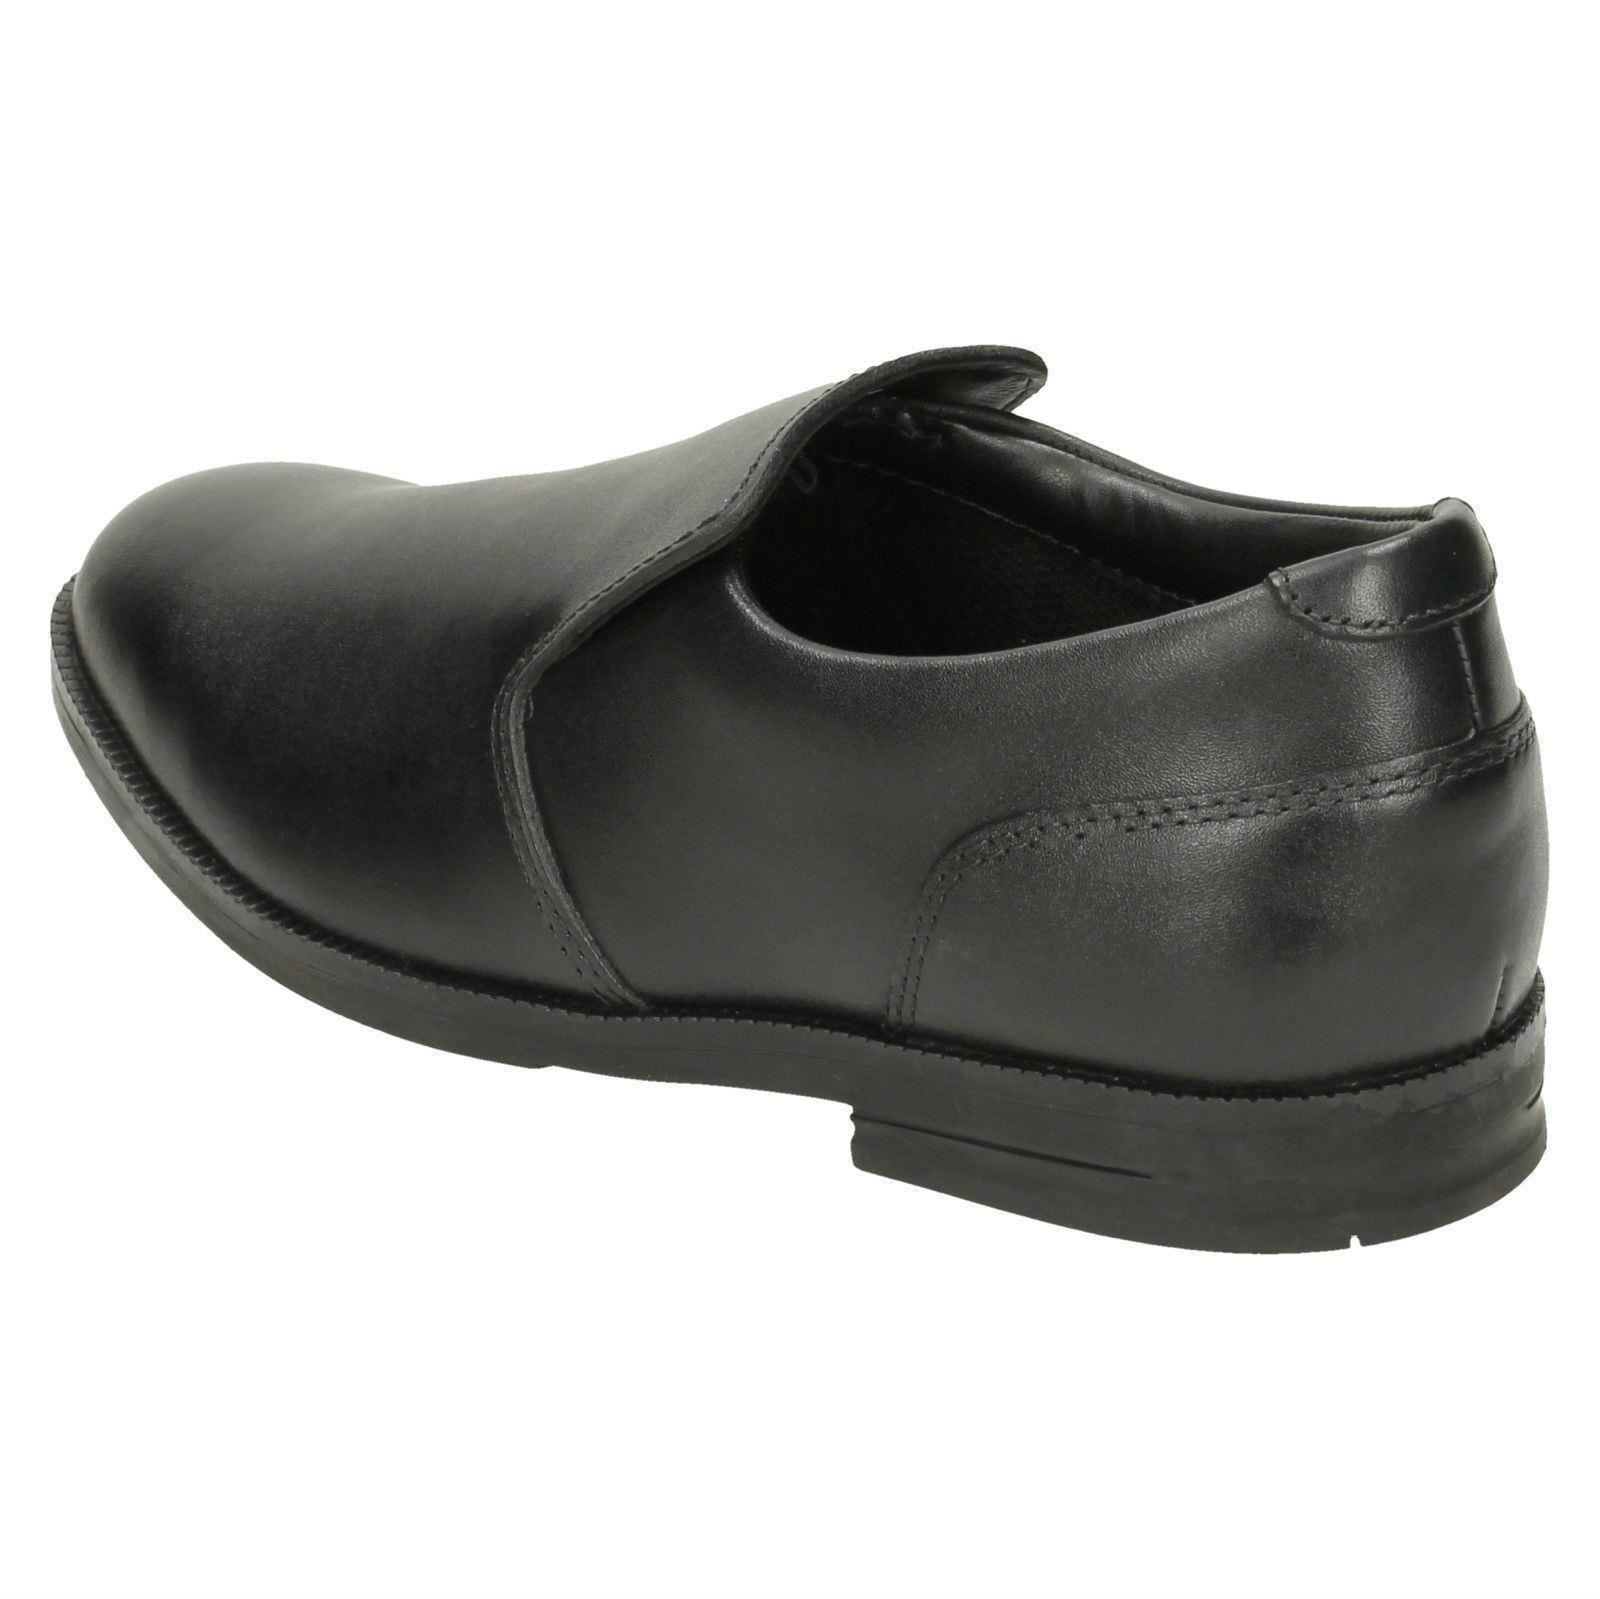 Shoes Bootleg Boys By Rufus School Clarks Black Way 6IrIqa